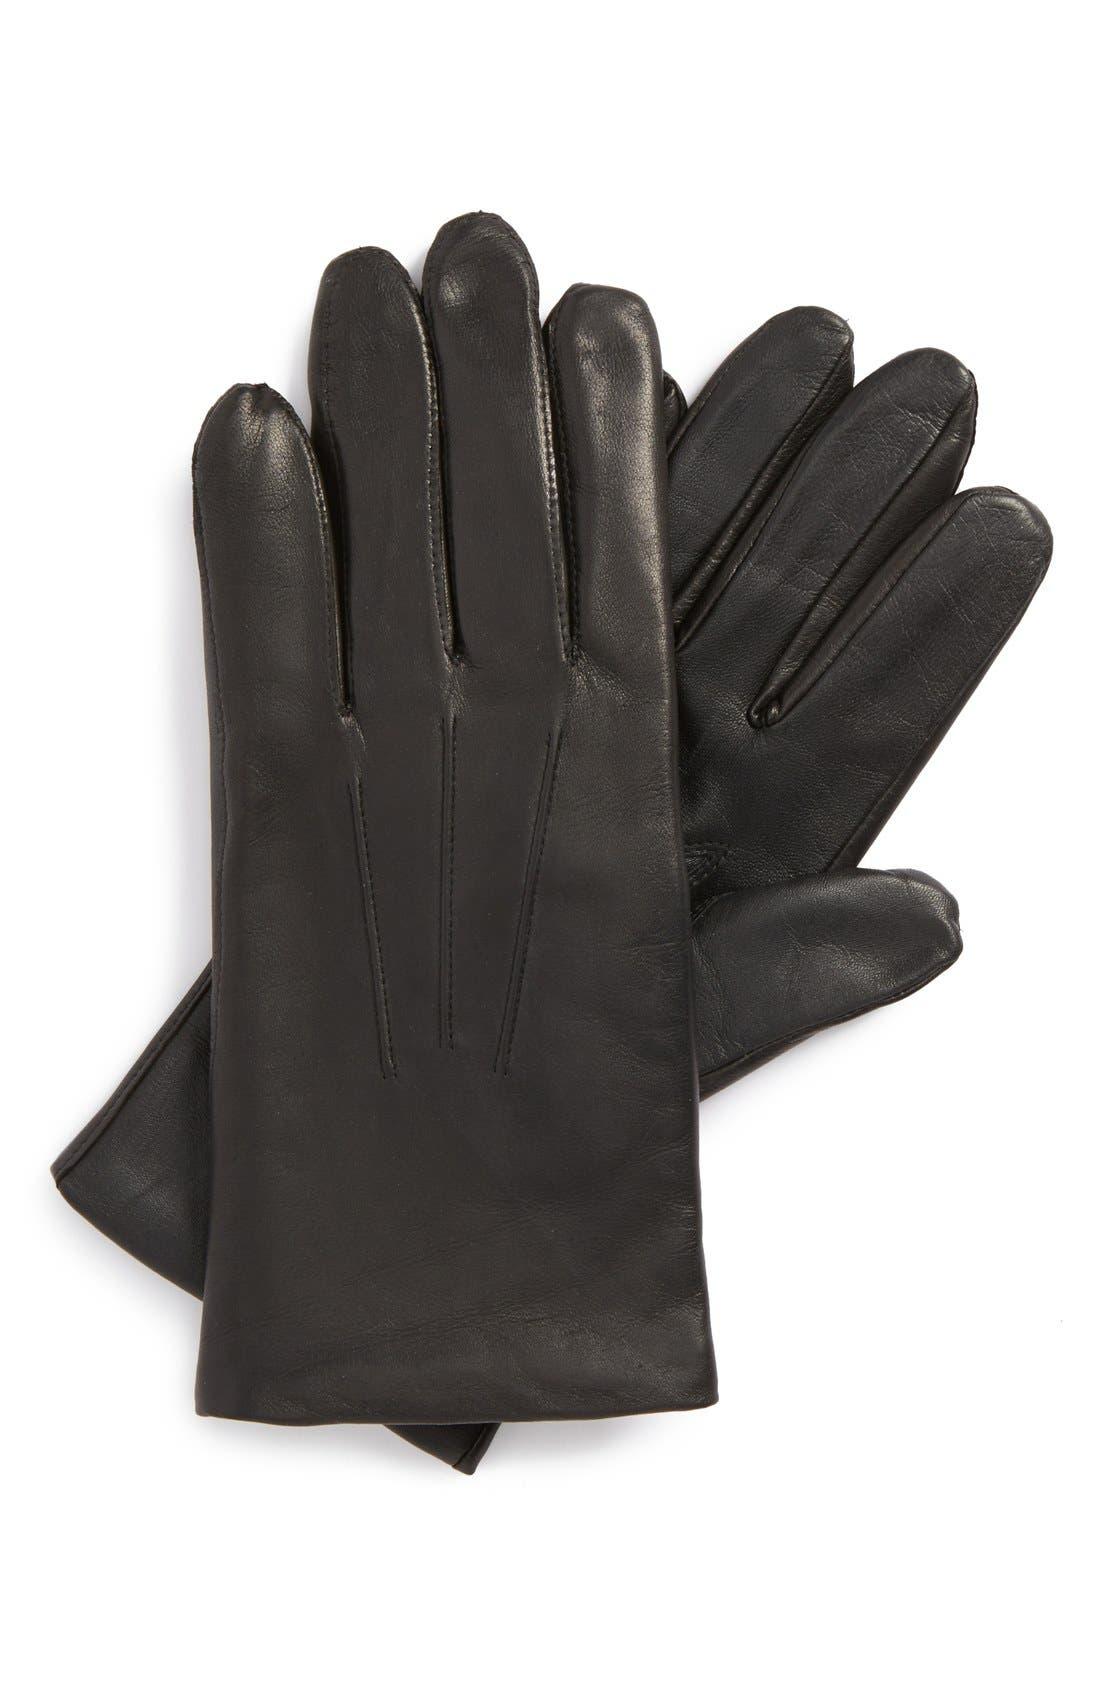 Leather Tech Gloves,                         Main,                         color, Black